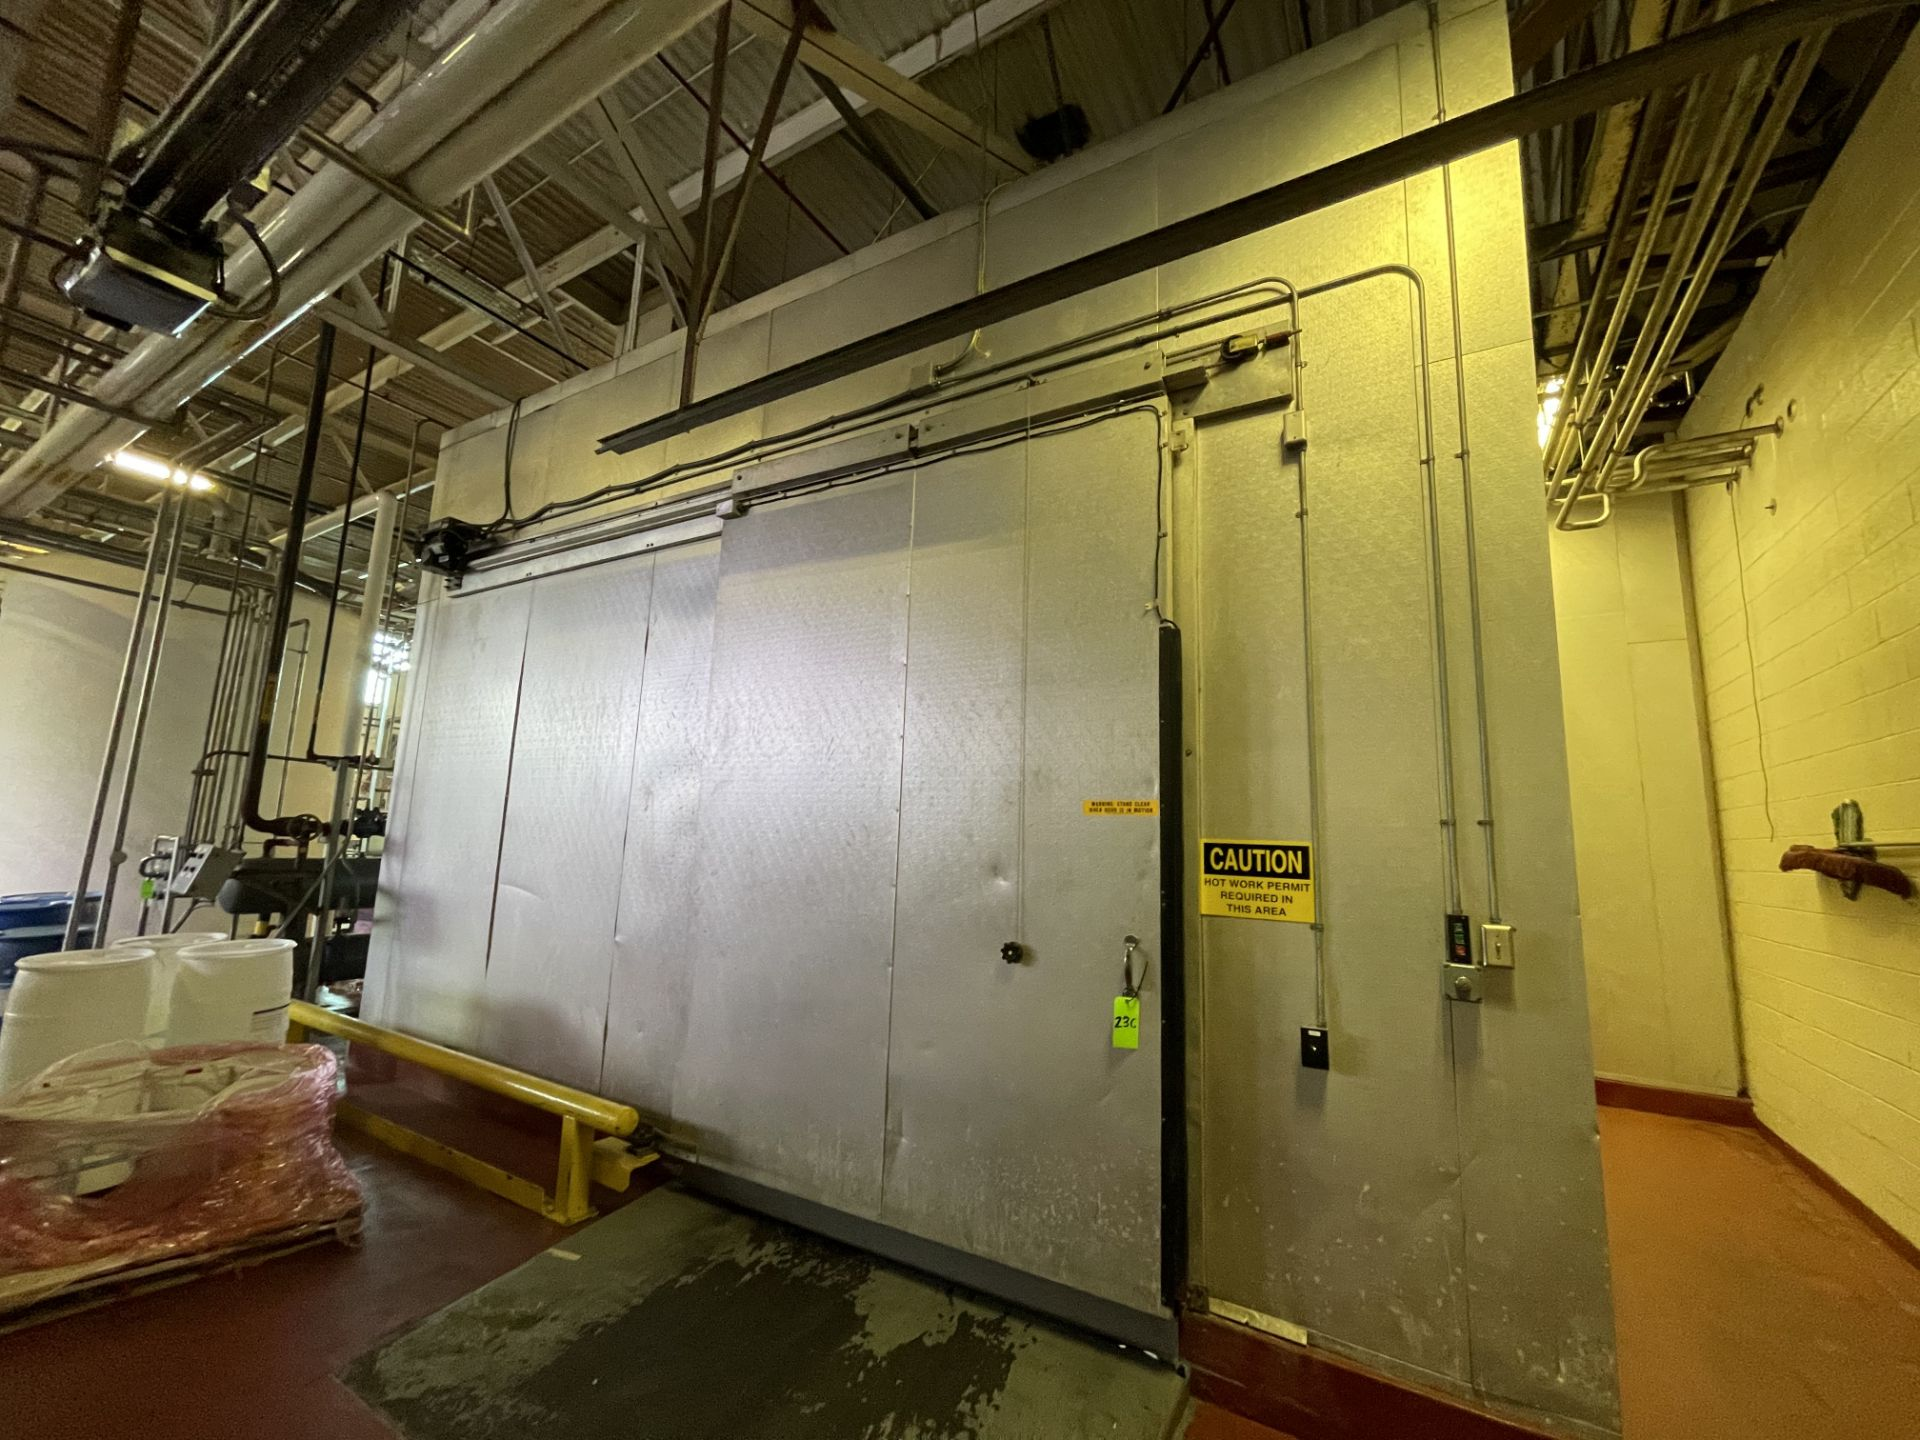 37x26 Cold Storage Room